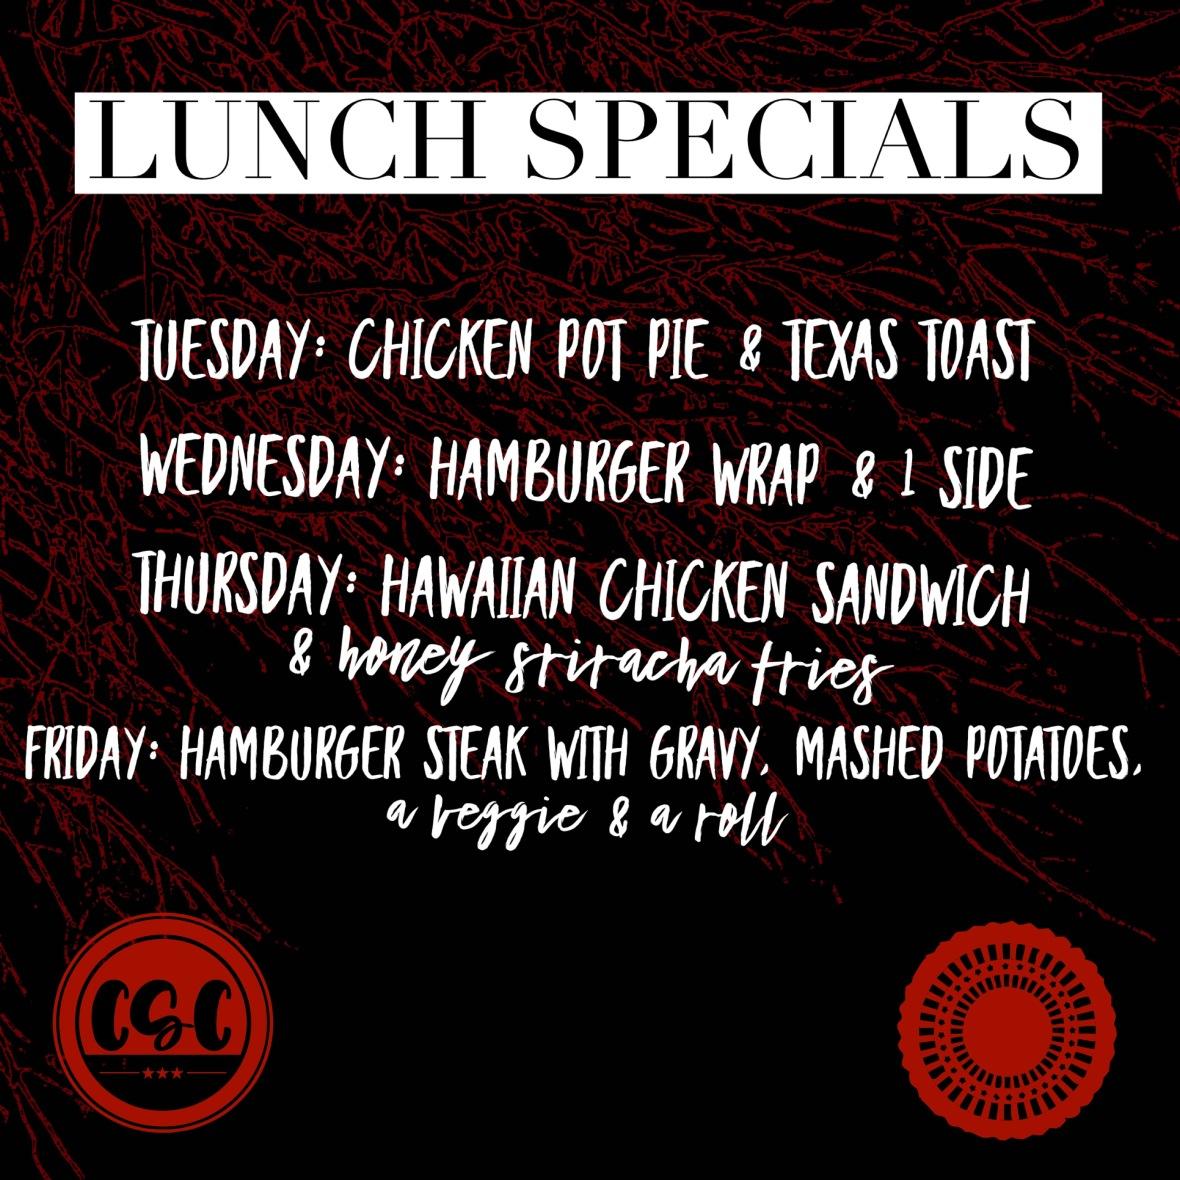 lunch specials june 3